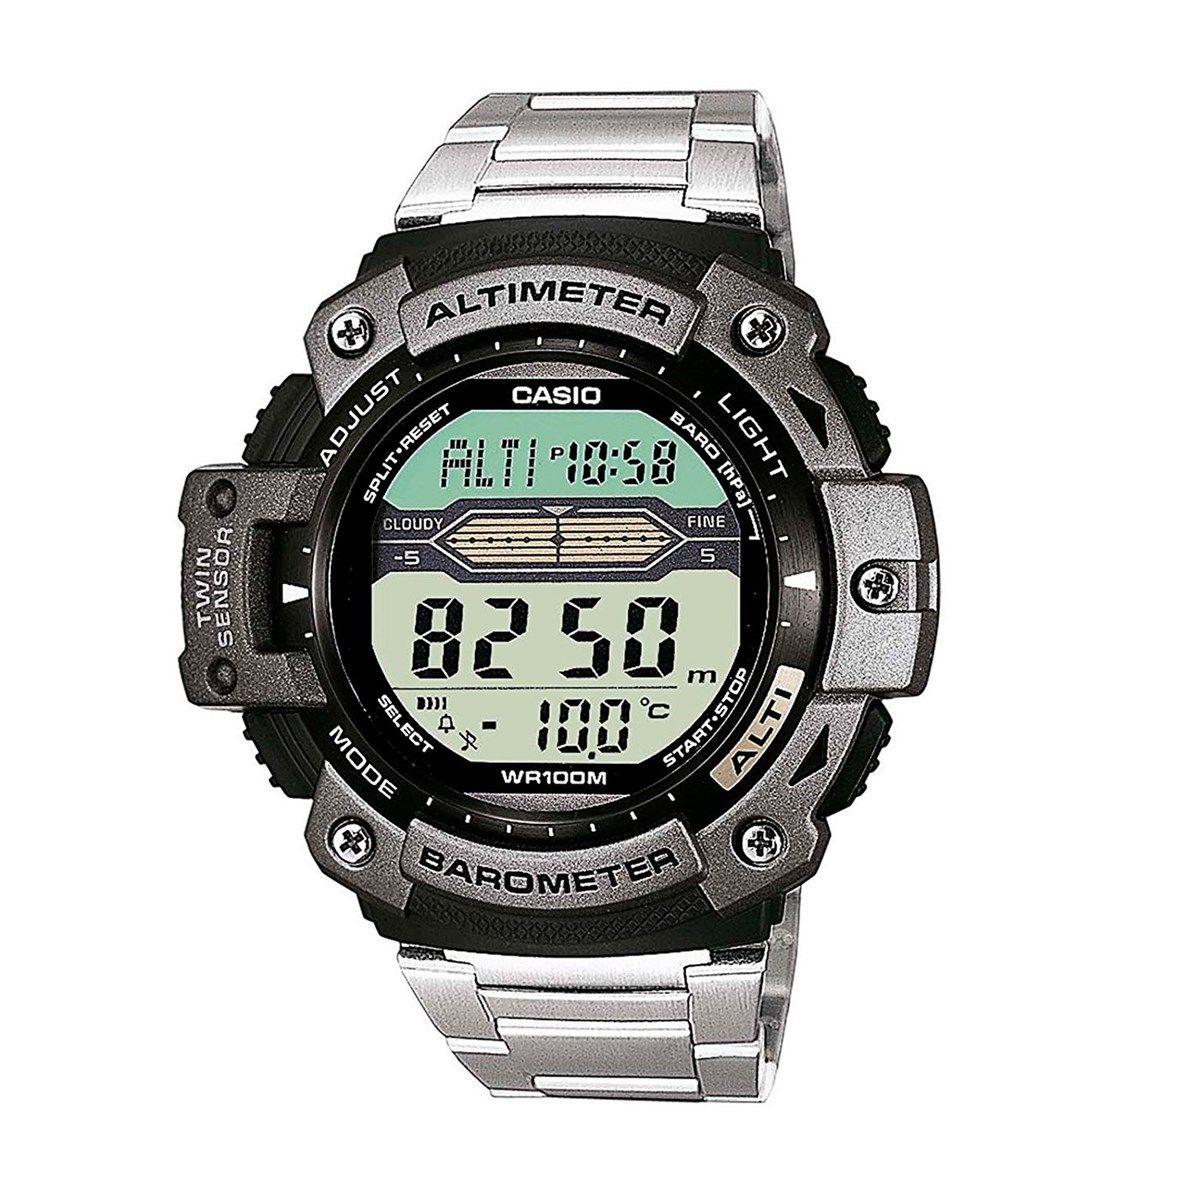 Relógio Casio OutGear SGW-300HD-1AVDR com Barômetro e Altímetro  - MGPesca